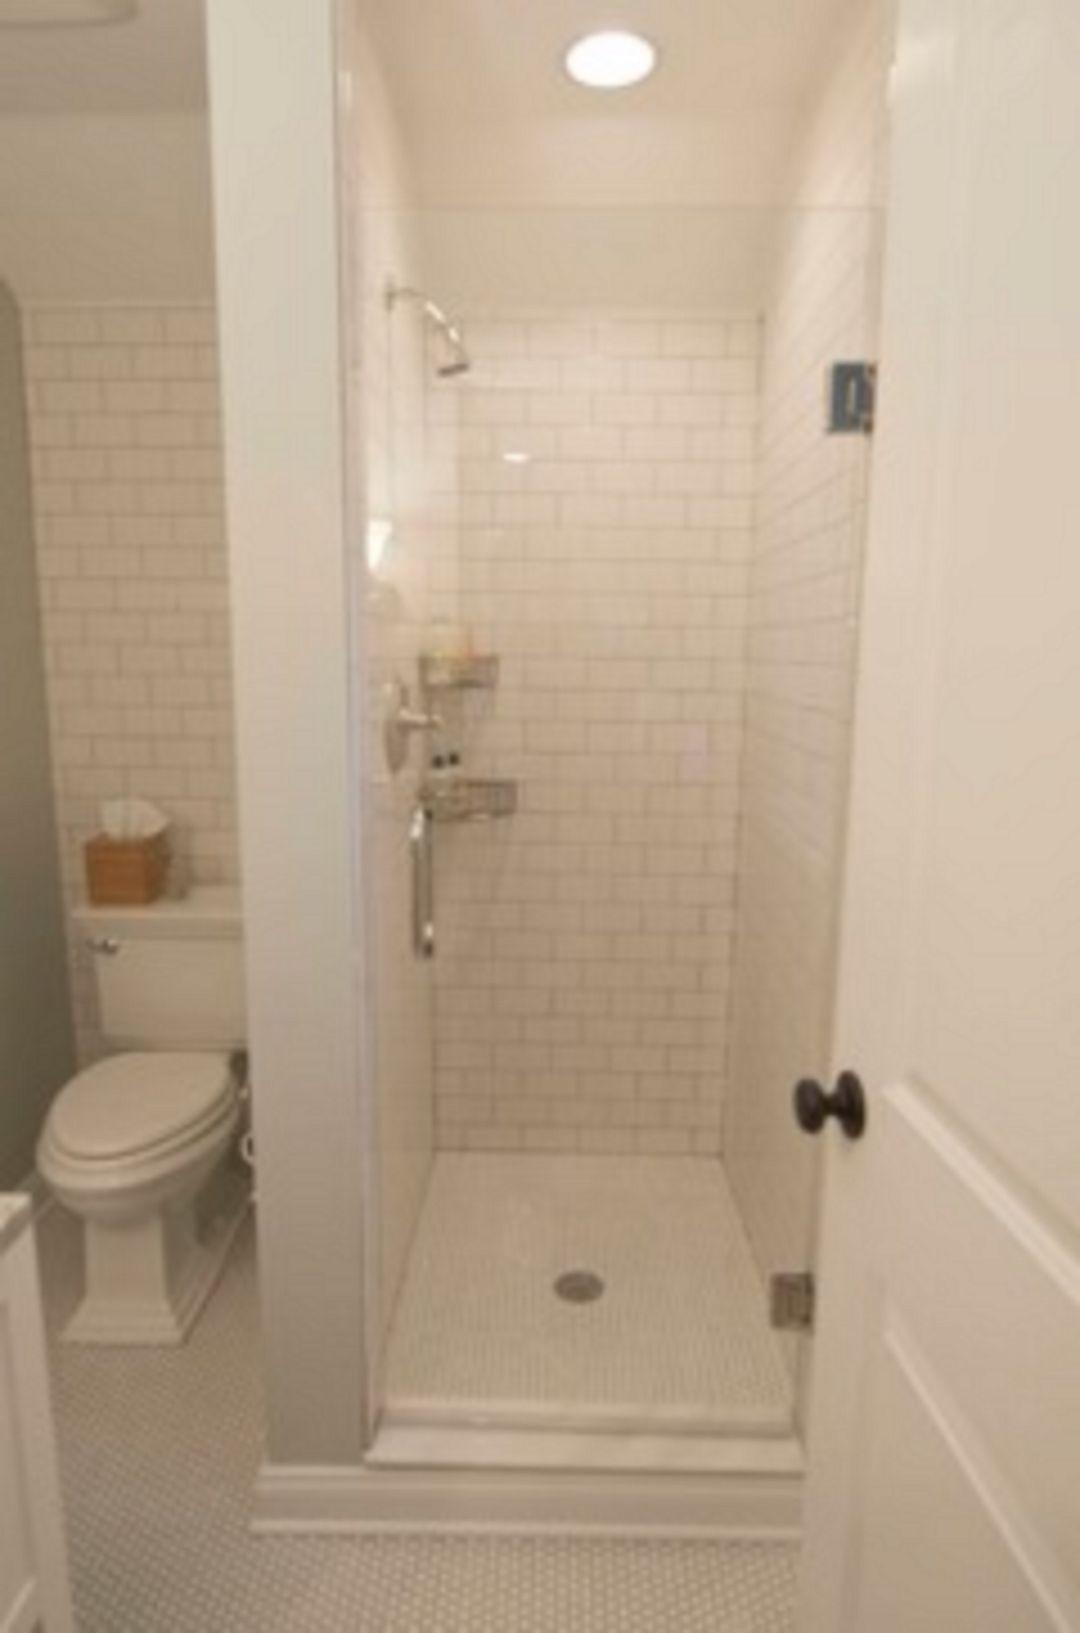 Extraordinary Bathroom Shower Ideas For Small Bathroom 162 Small Bathroom Layout Bathroom Layout Bathroom Design Small